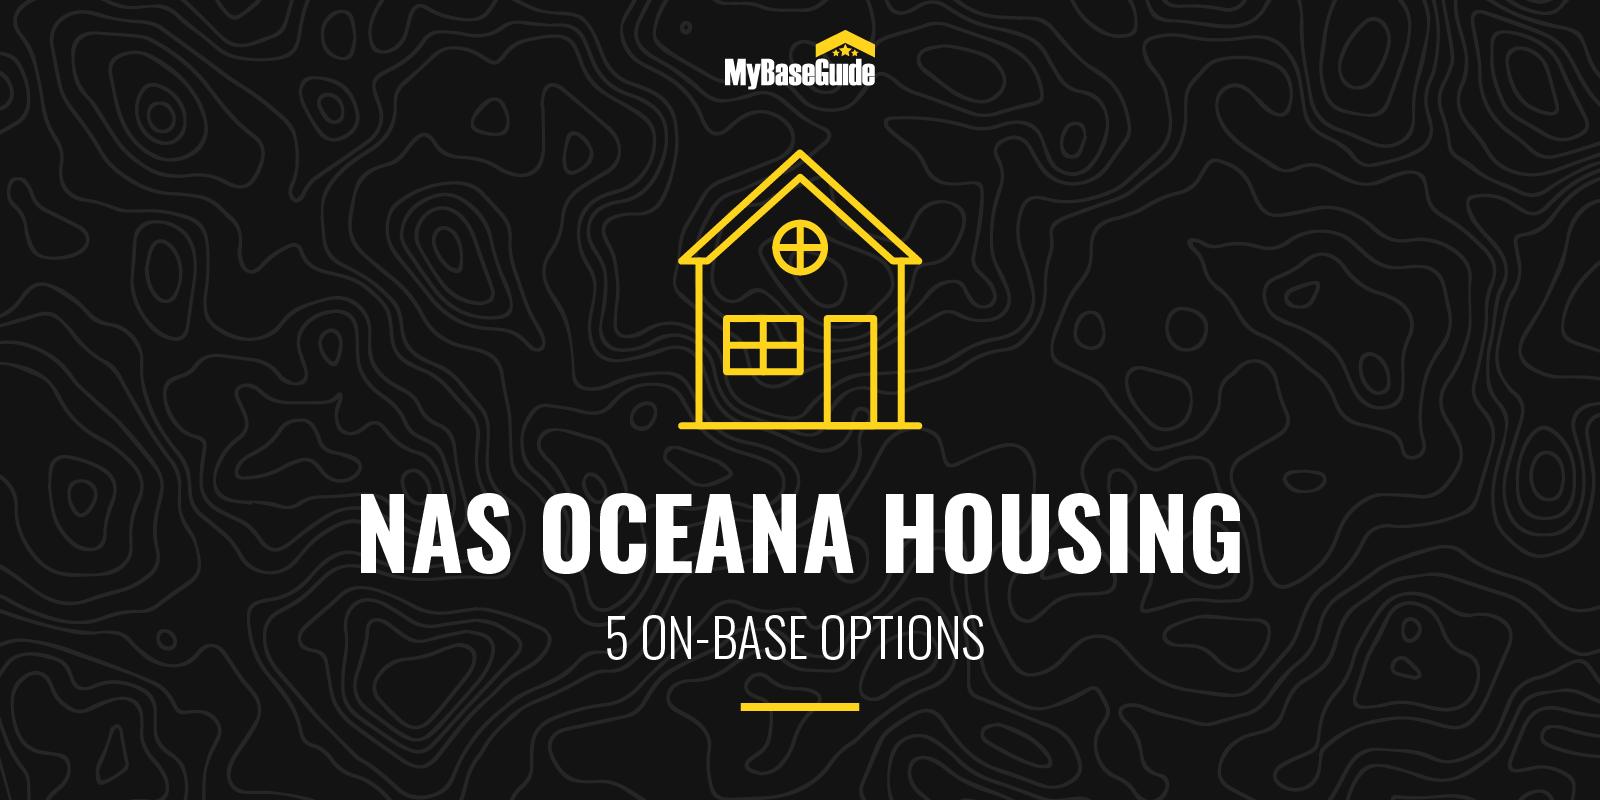 NAS Oceana Housing: 5 On-Base Options